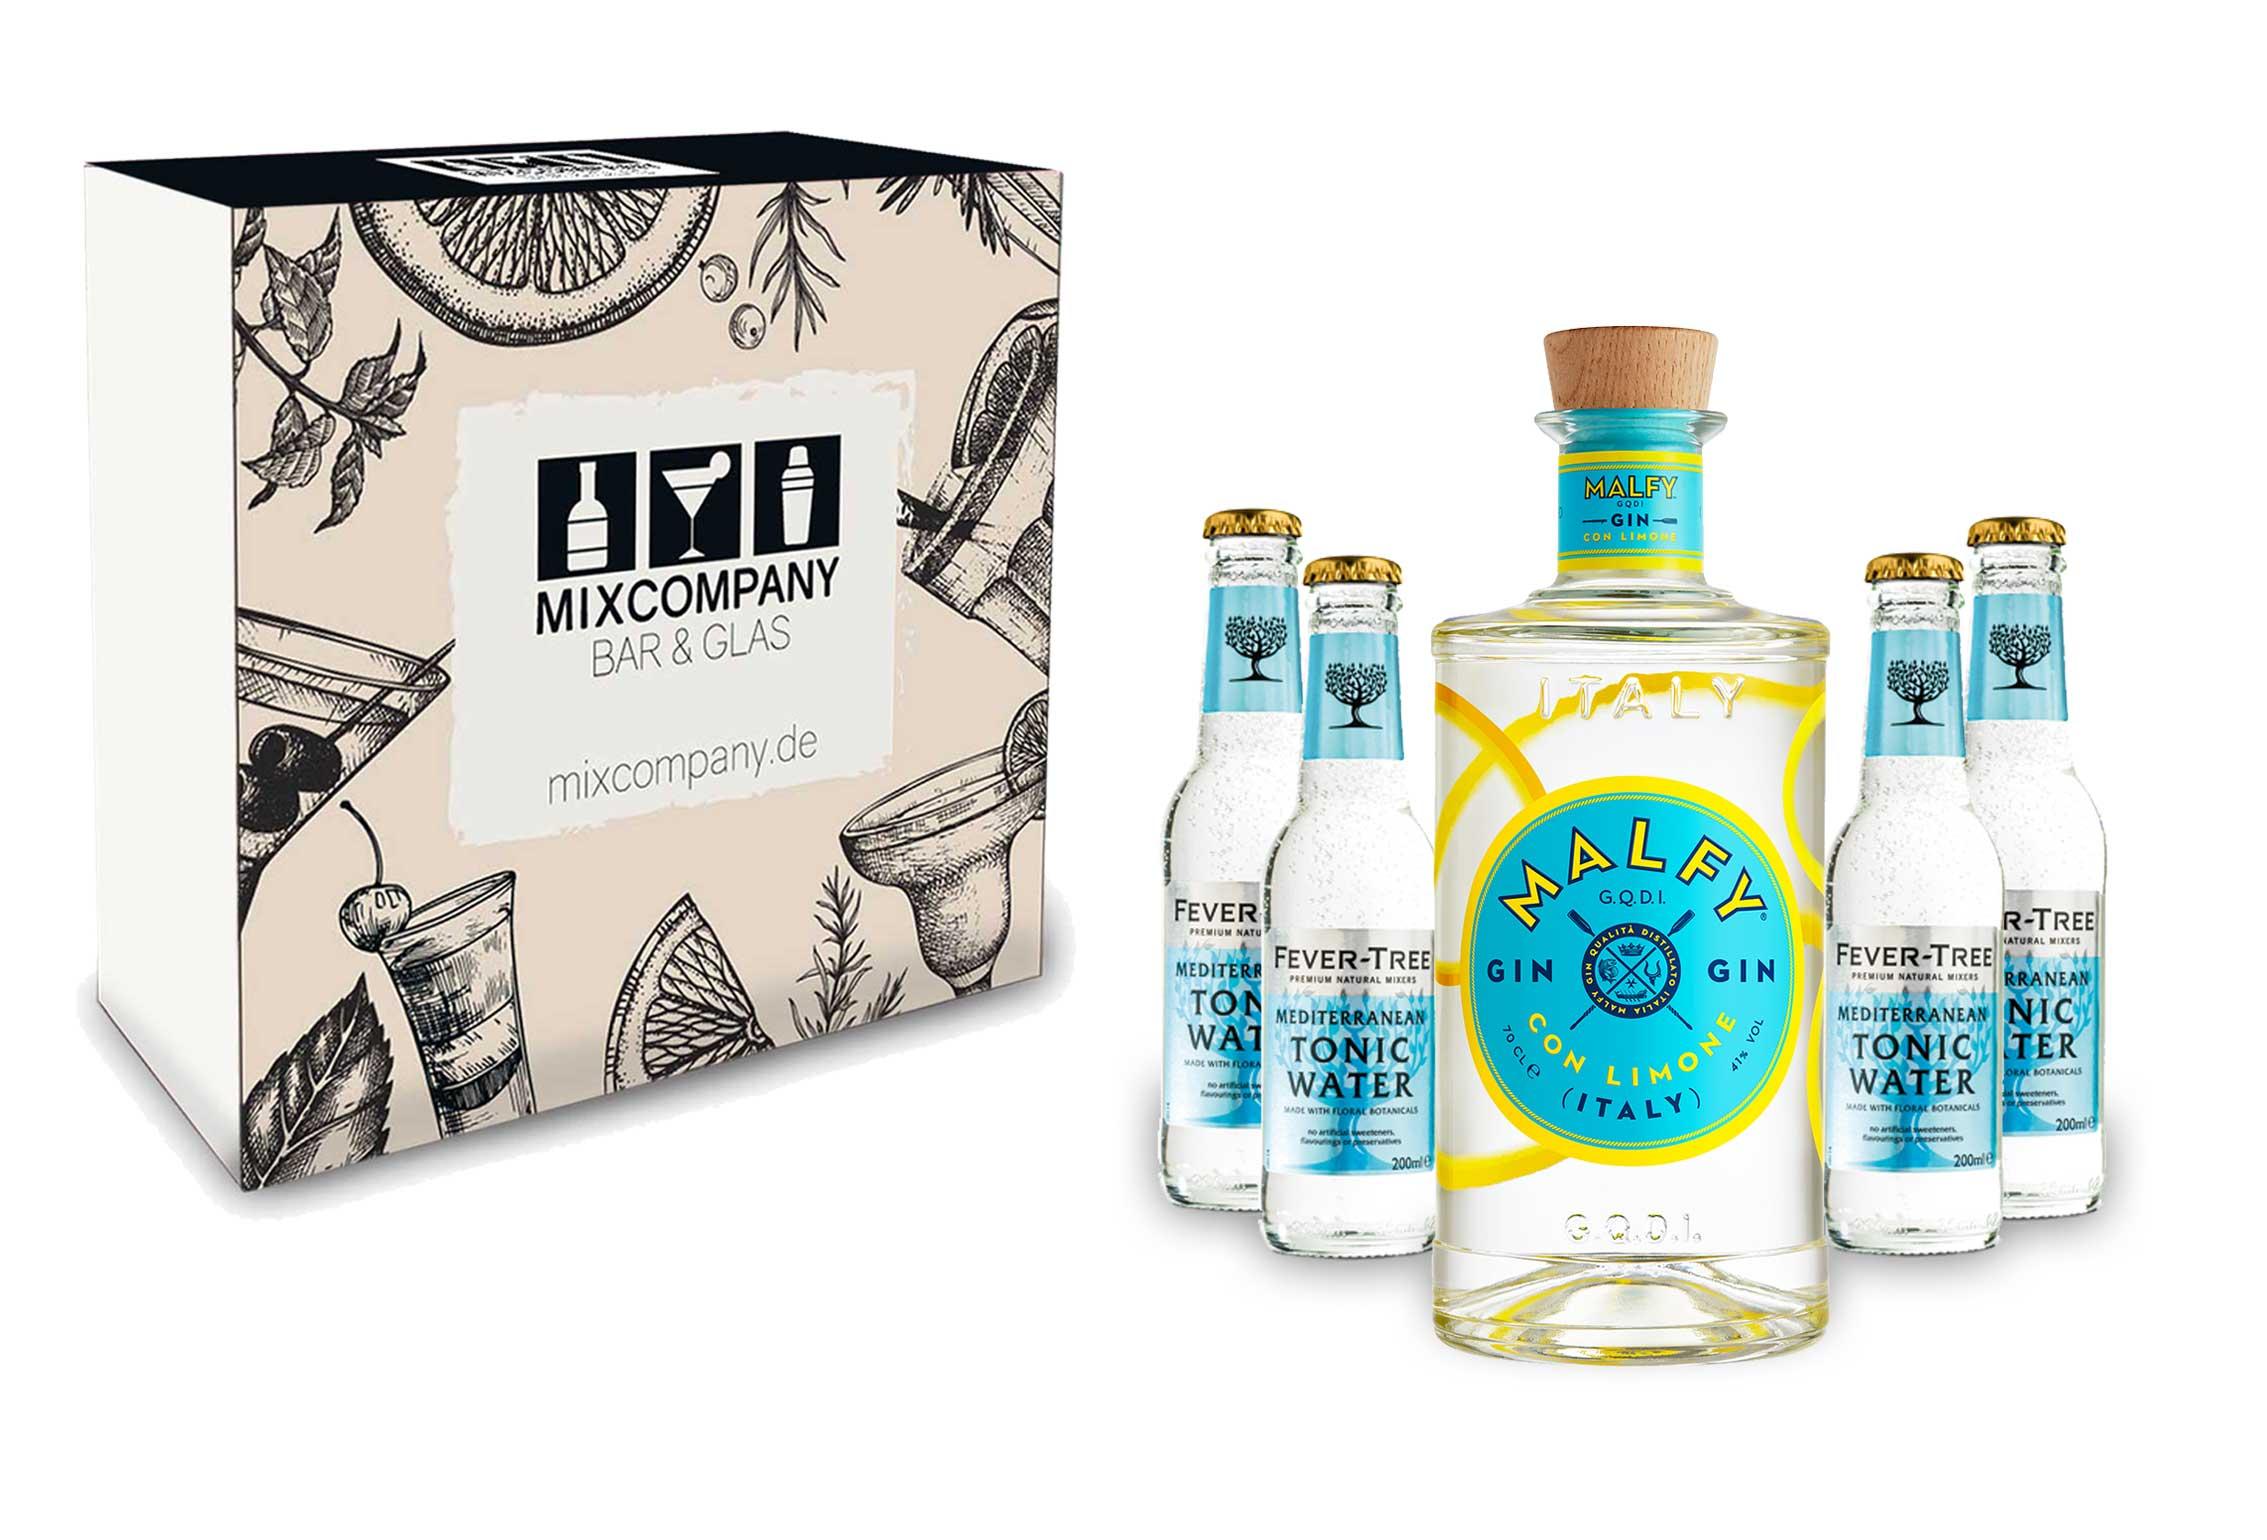 Malfy Gin Tonic Giftbox Set - Malfy Gin con Limone (Zitrone) 0,7l - 700ml (41% VOL) + 4x Fever-Tree Mediterranean Tonic Water 200ml inkl. Pfand MEHRWEG- [Enthält Sulfite]